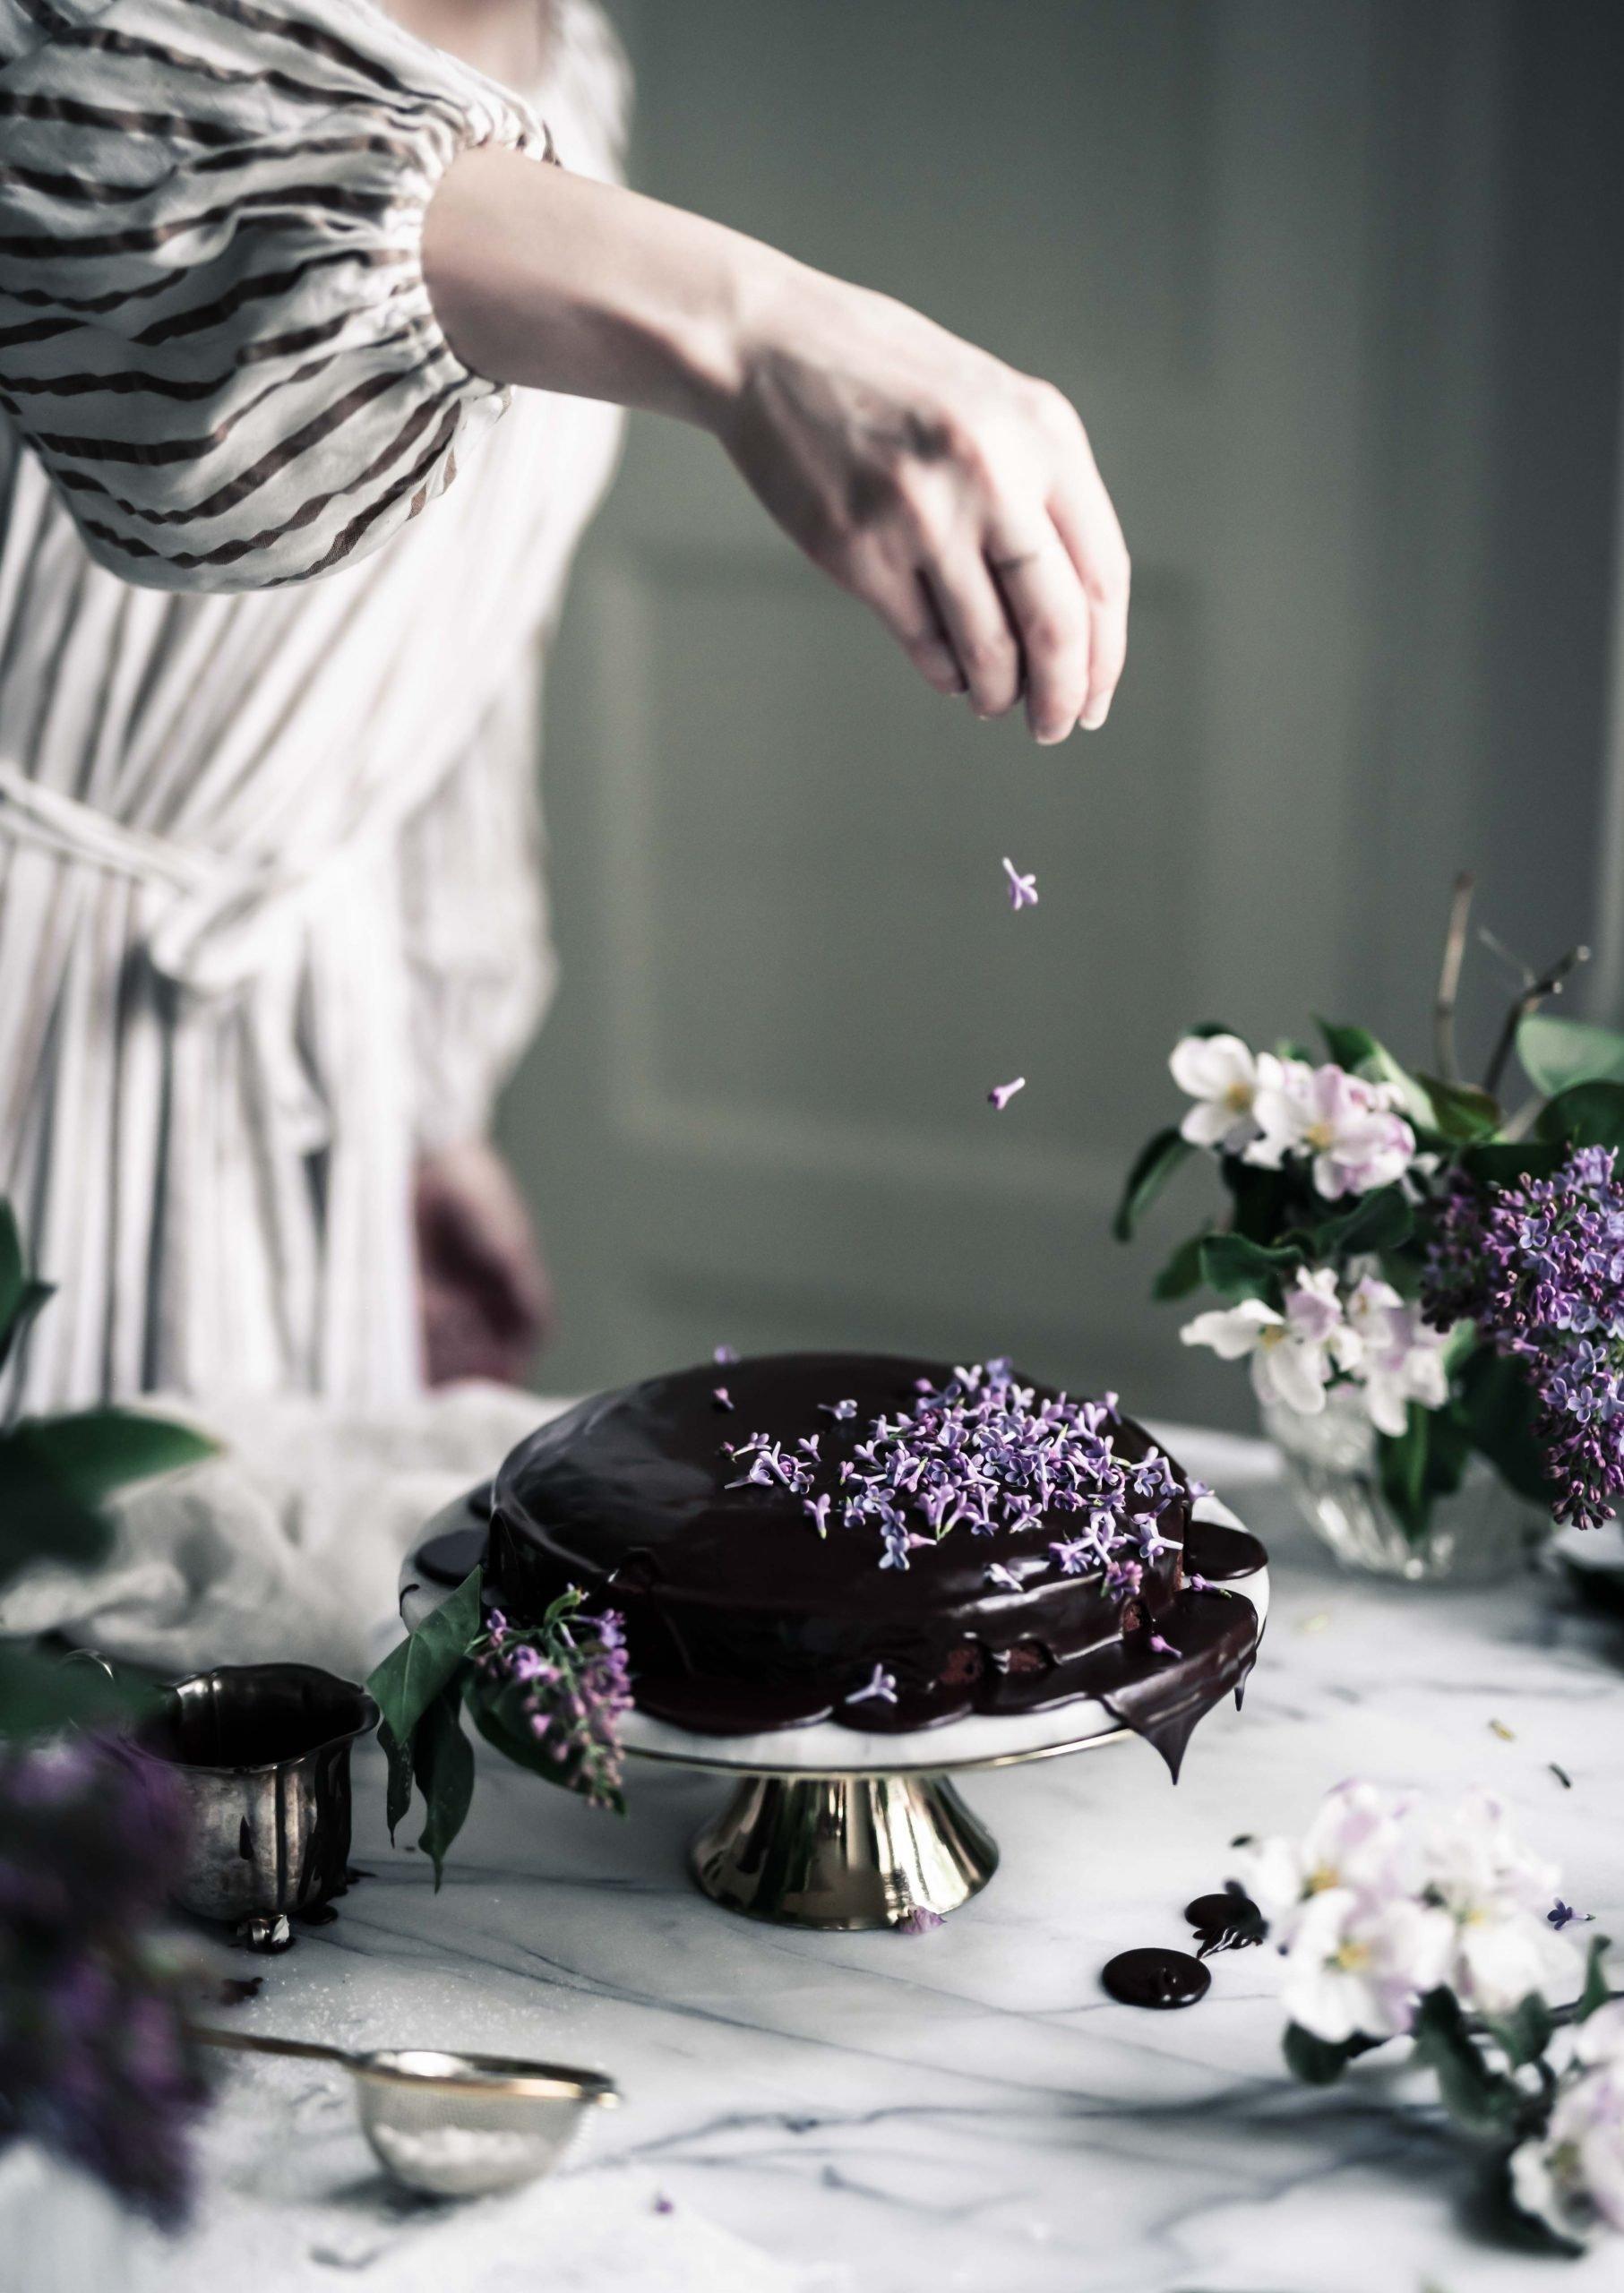 Easy mocha cake recipe by Emma Ivane